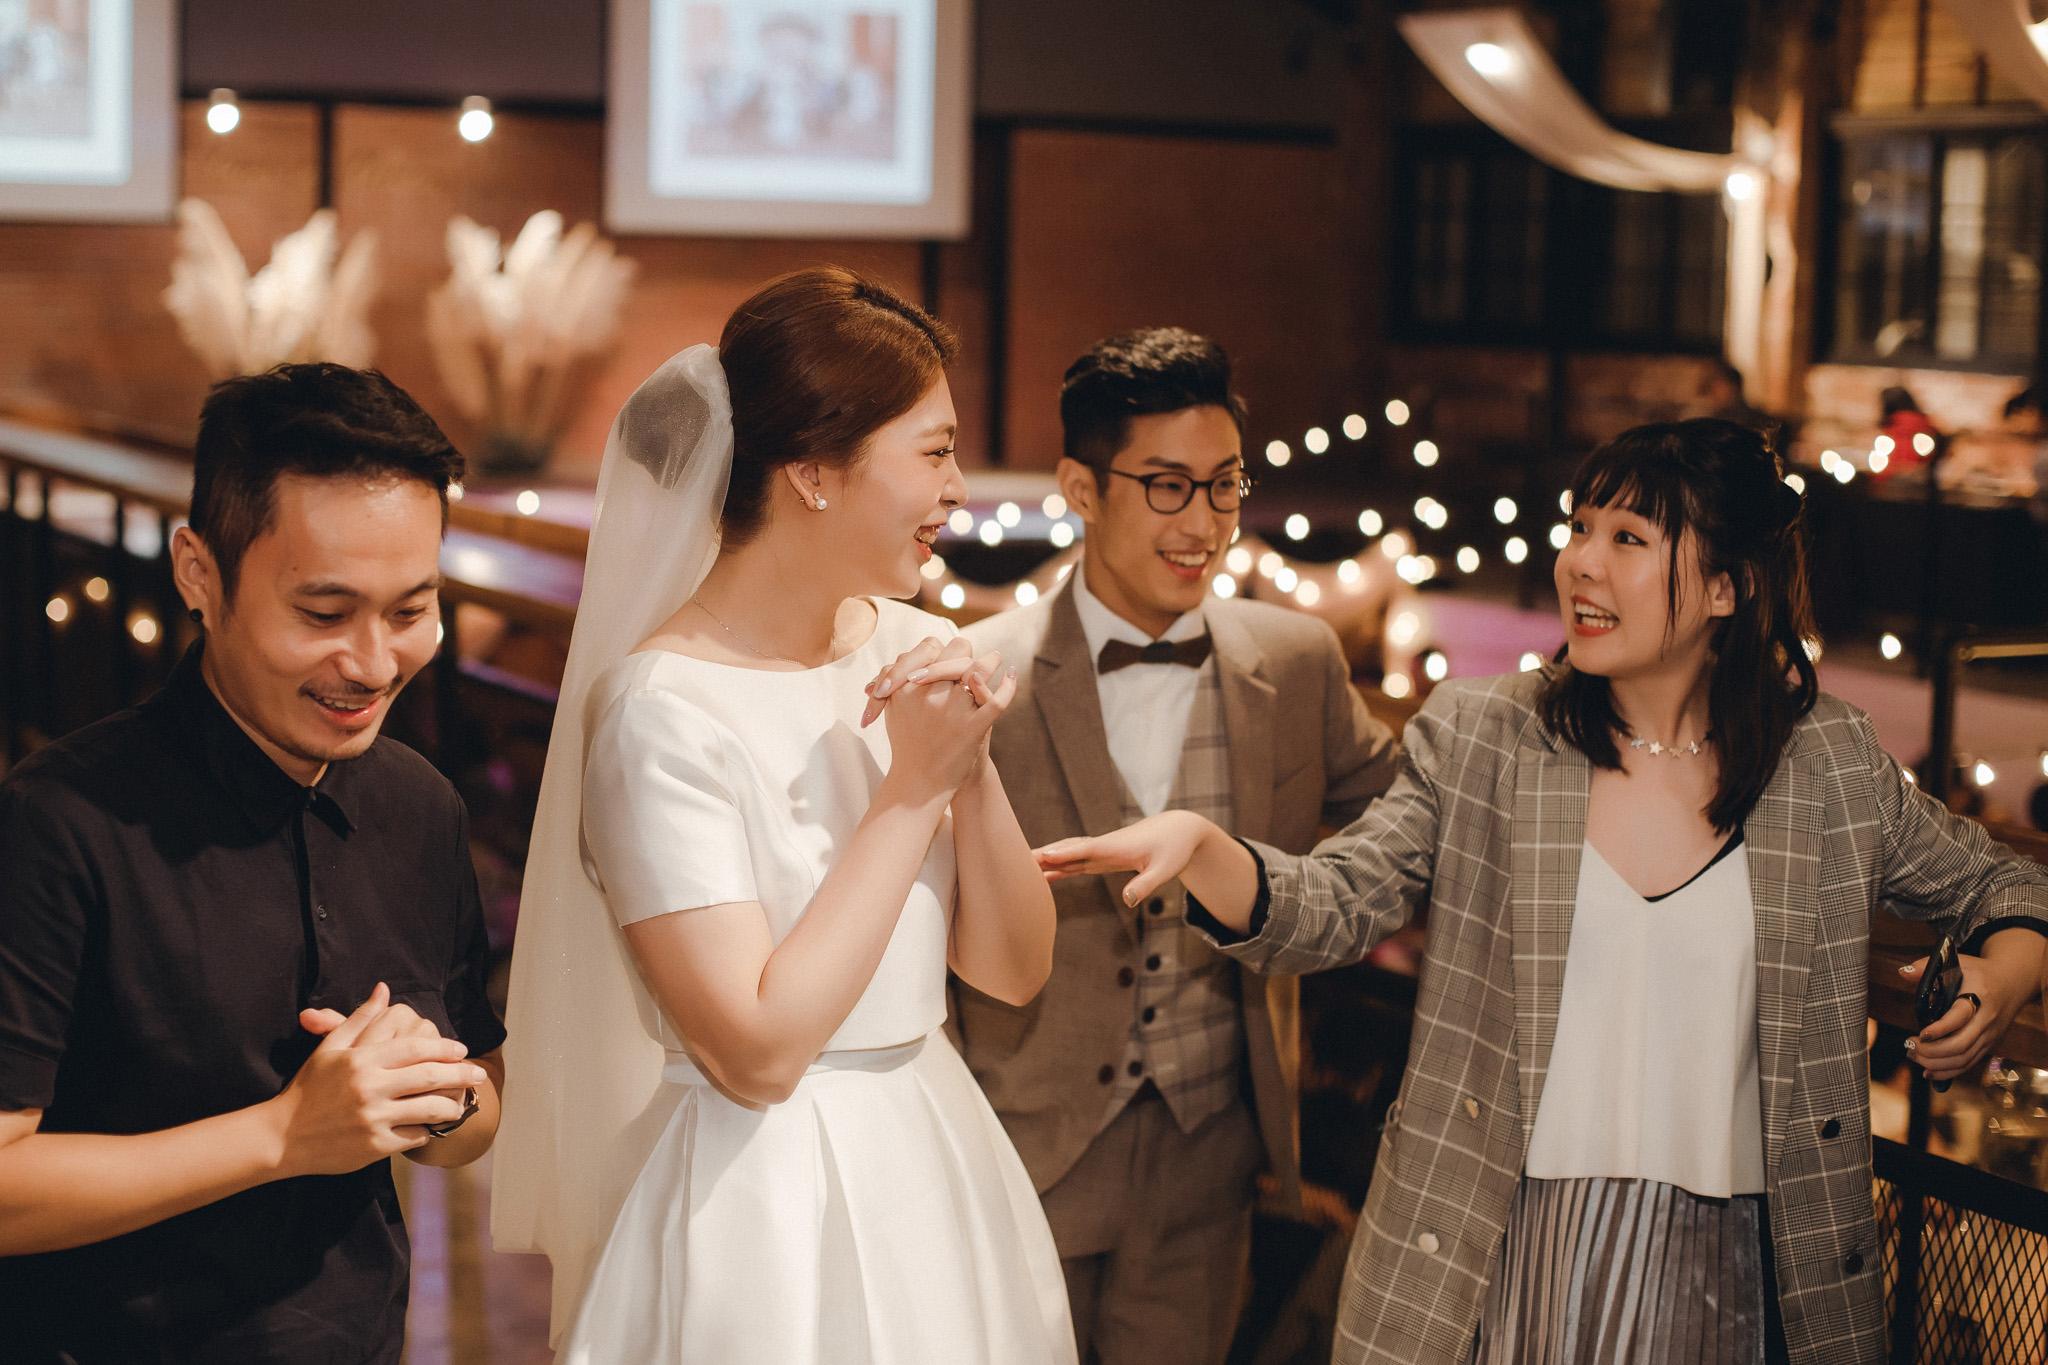 EW 台北婚攝 居米 濟南教會 Brick Yard 33 美軍俱樂部 婚禮 婚宴-80